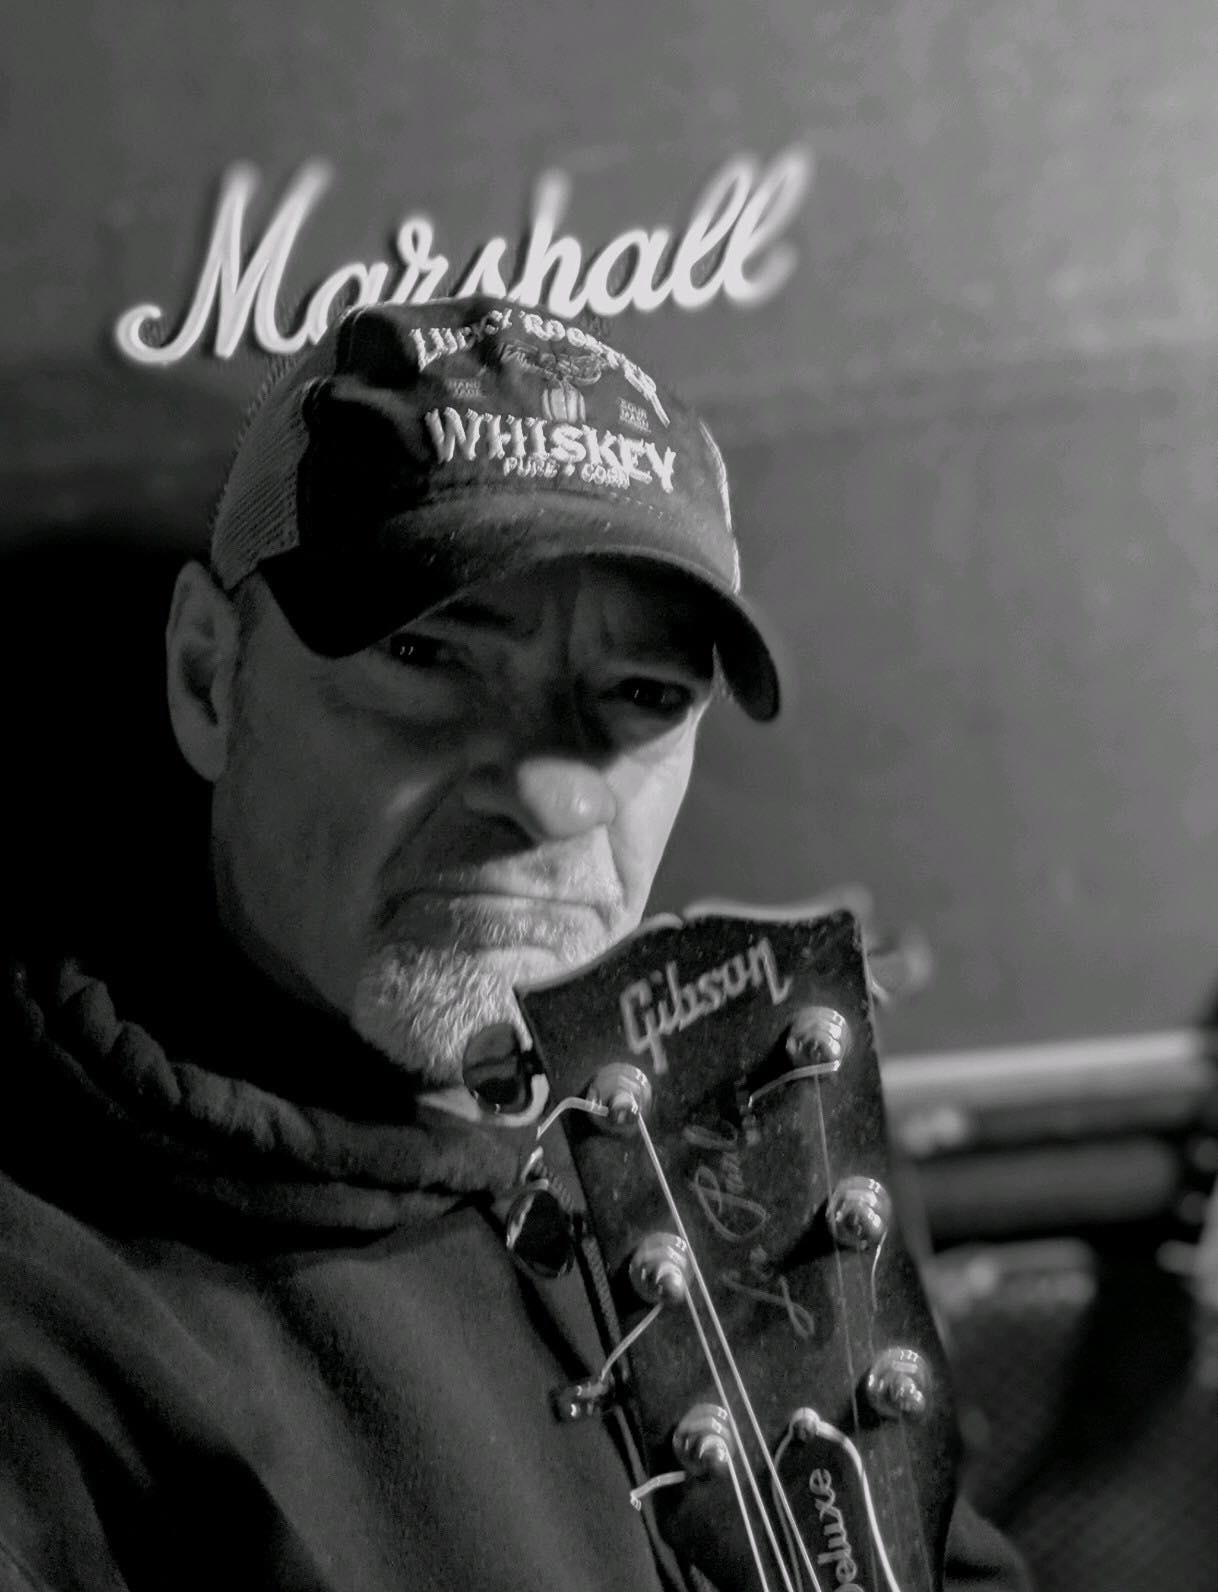 Colt Marshall